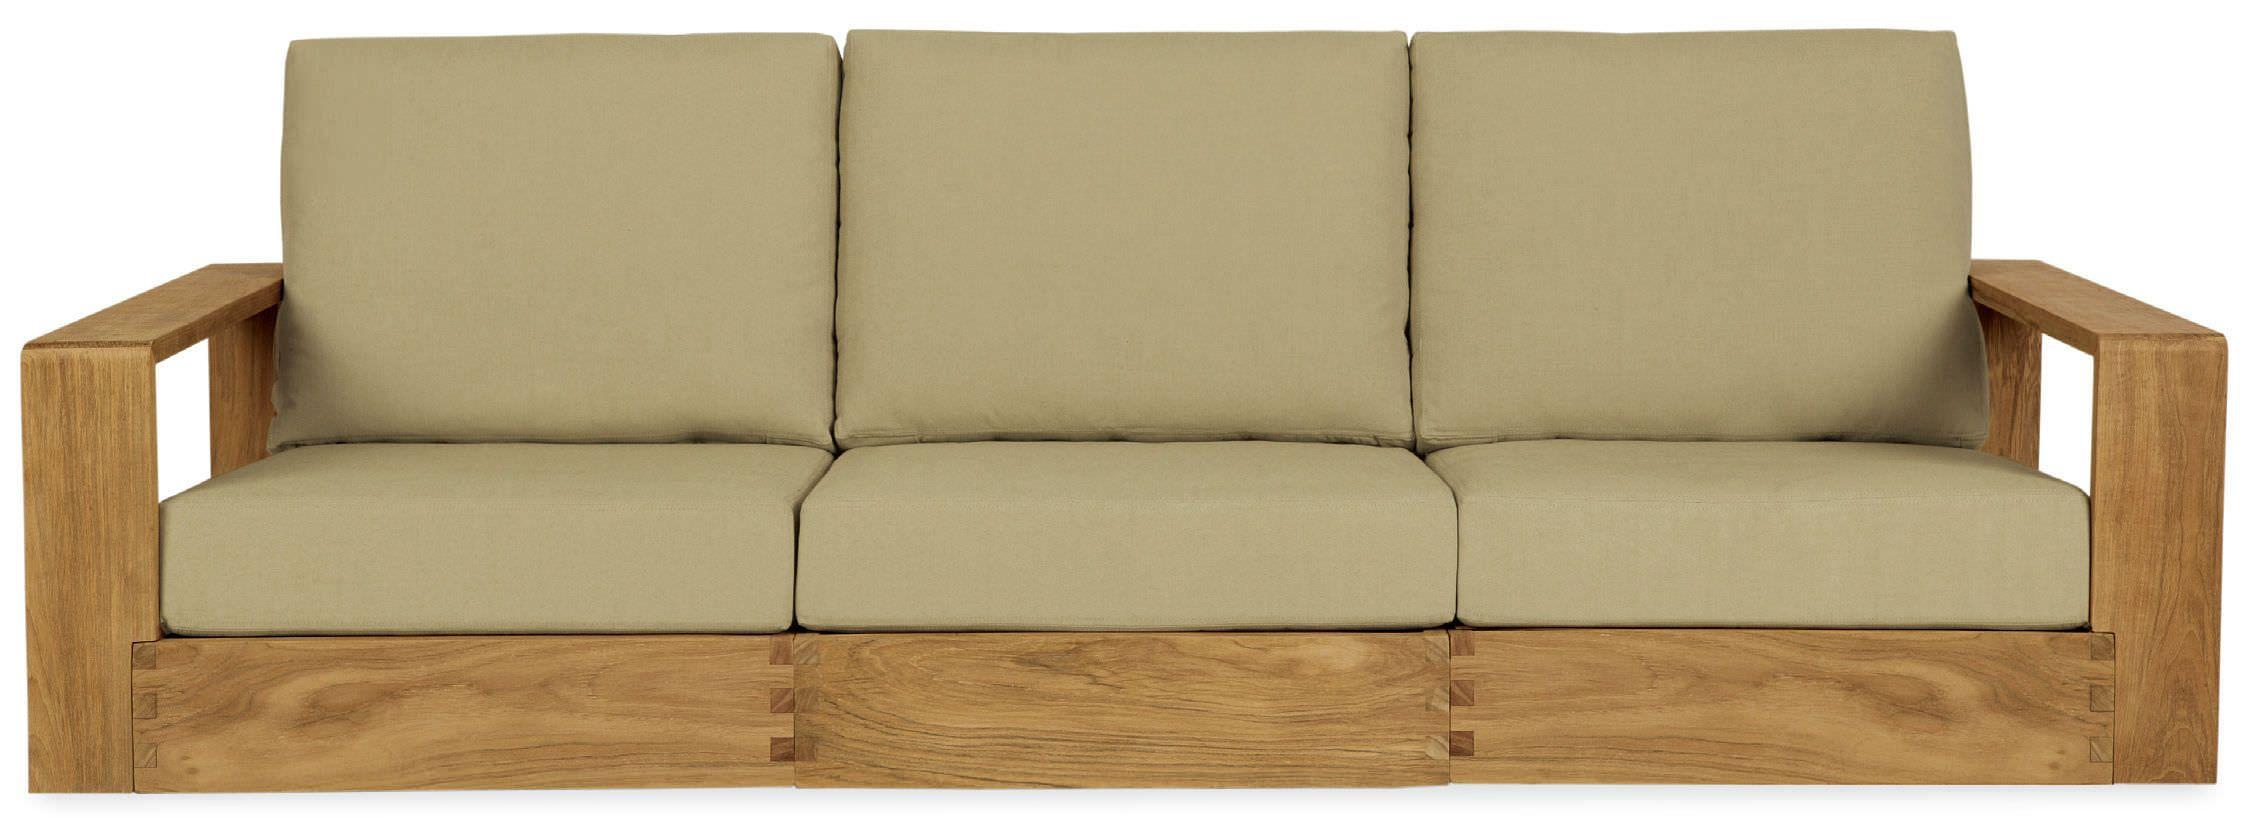 teak wood sofa rate in chennai friheten corner bed with storage cover sofas tamil nadu india